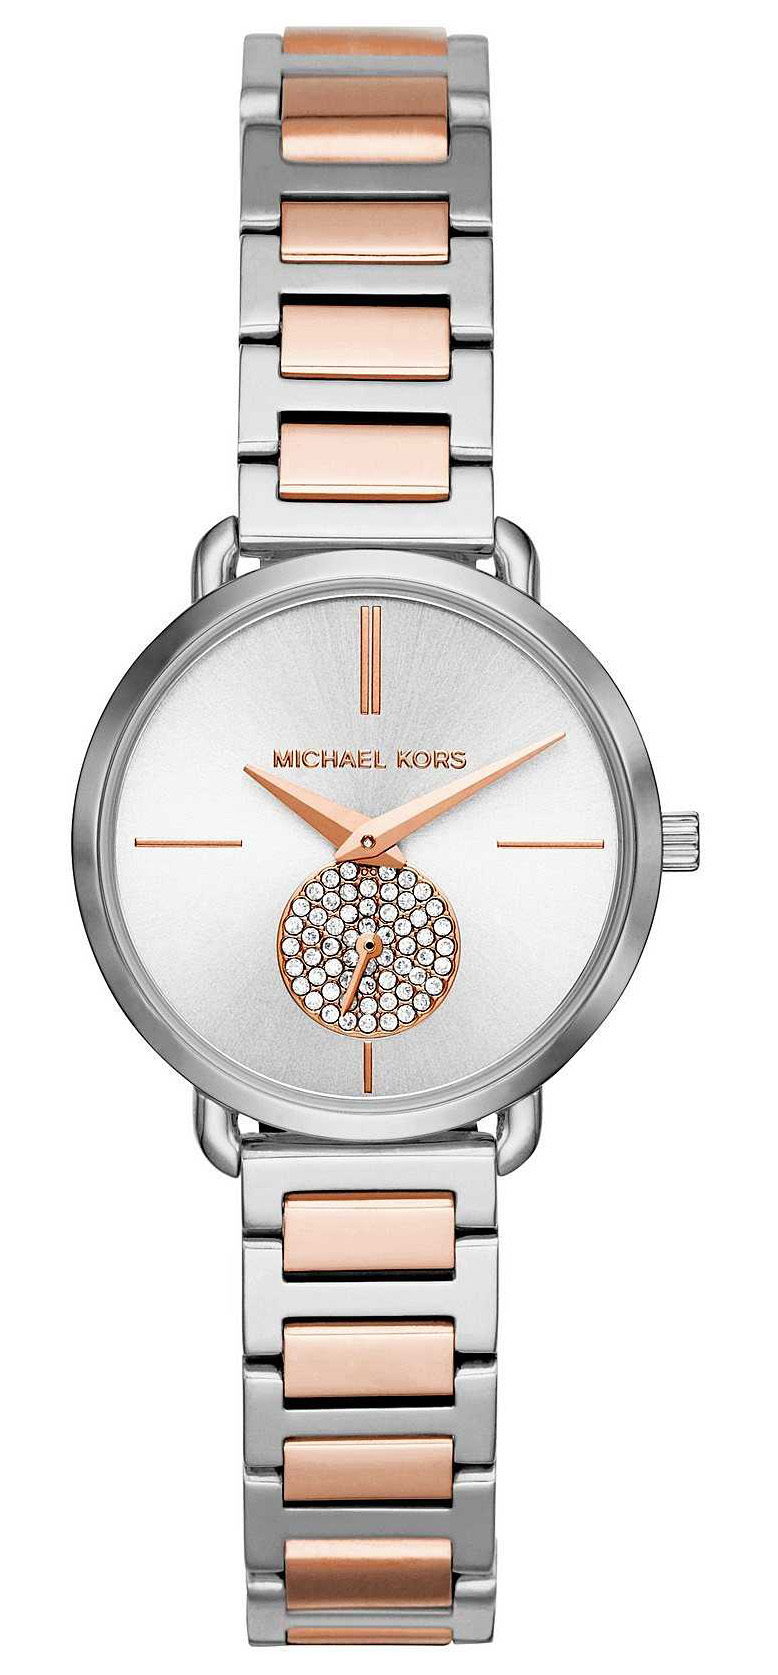 MICHAEL KORS Portia MK4453